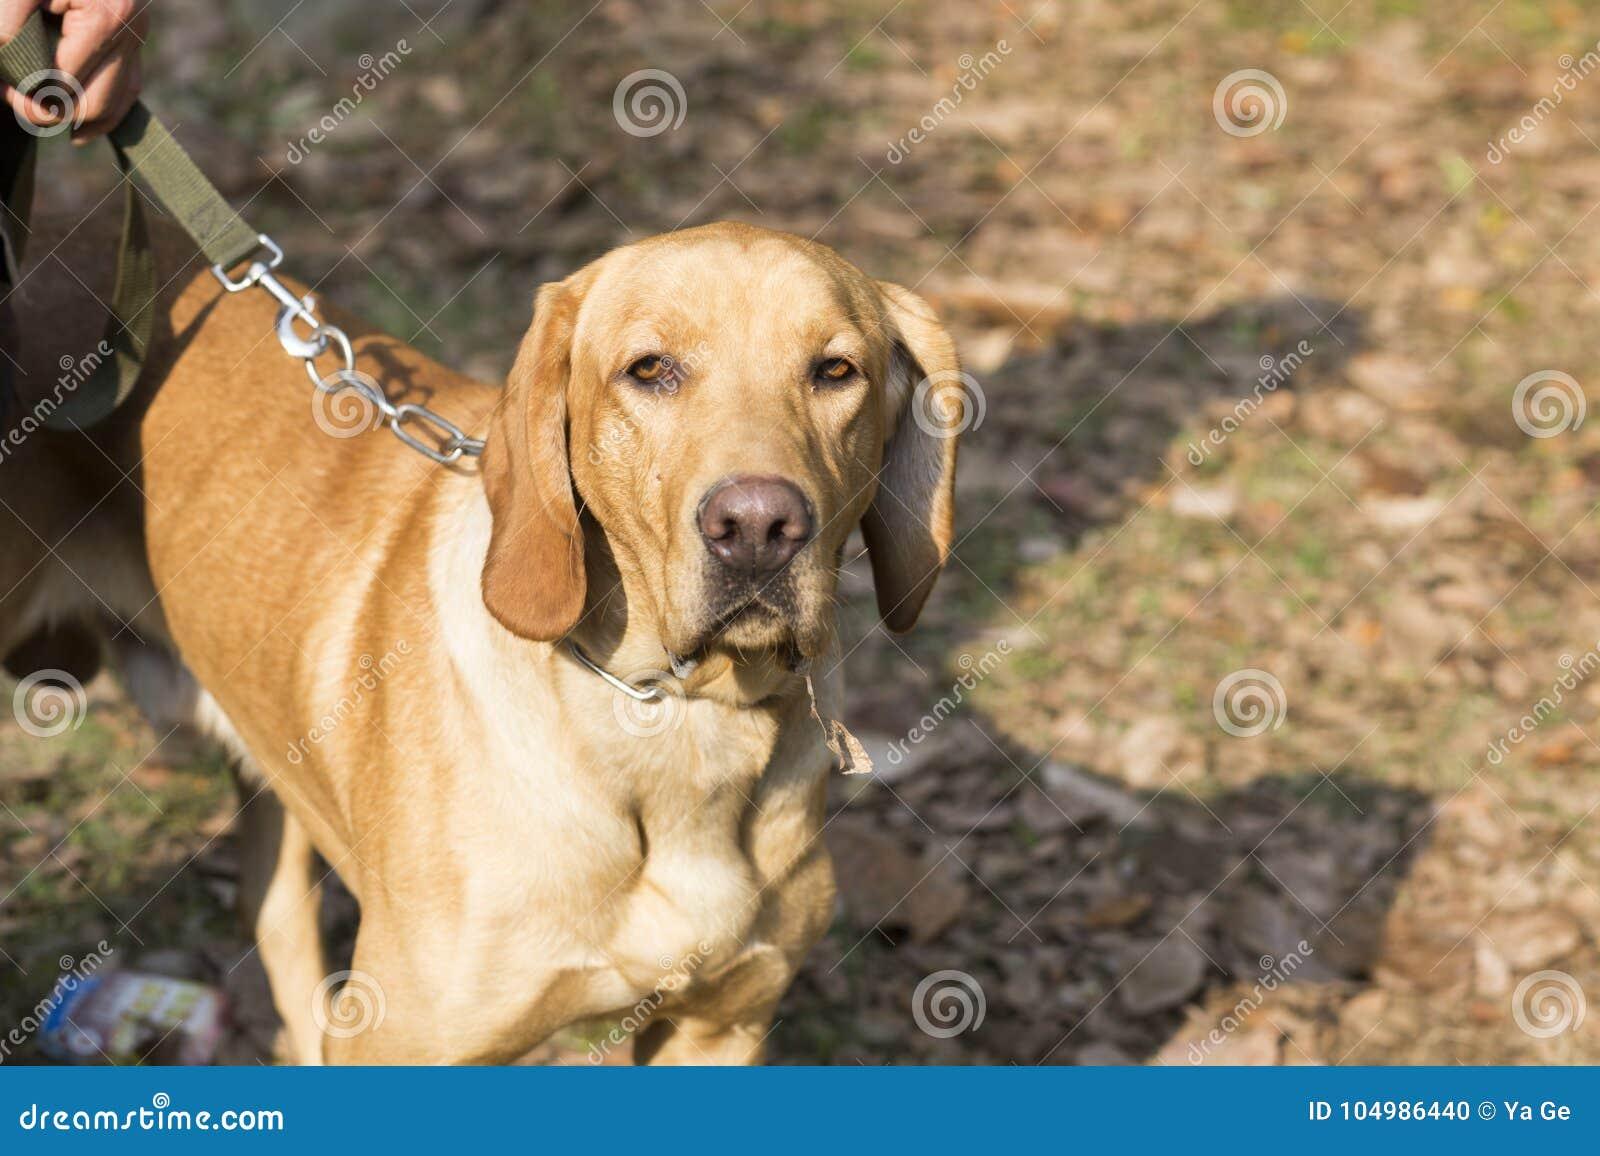 Retriever κουταβιών του Λαμπραντόρ σκυλιών ανασκόπησης γκρίζα οπίσθια όψη